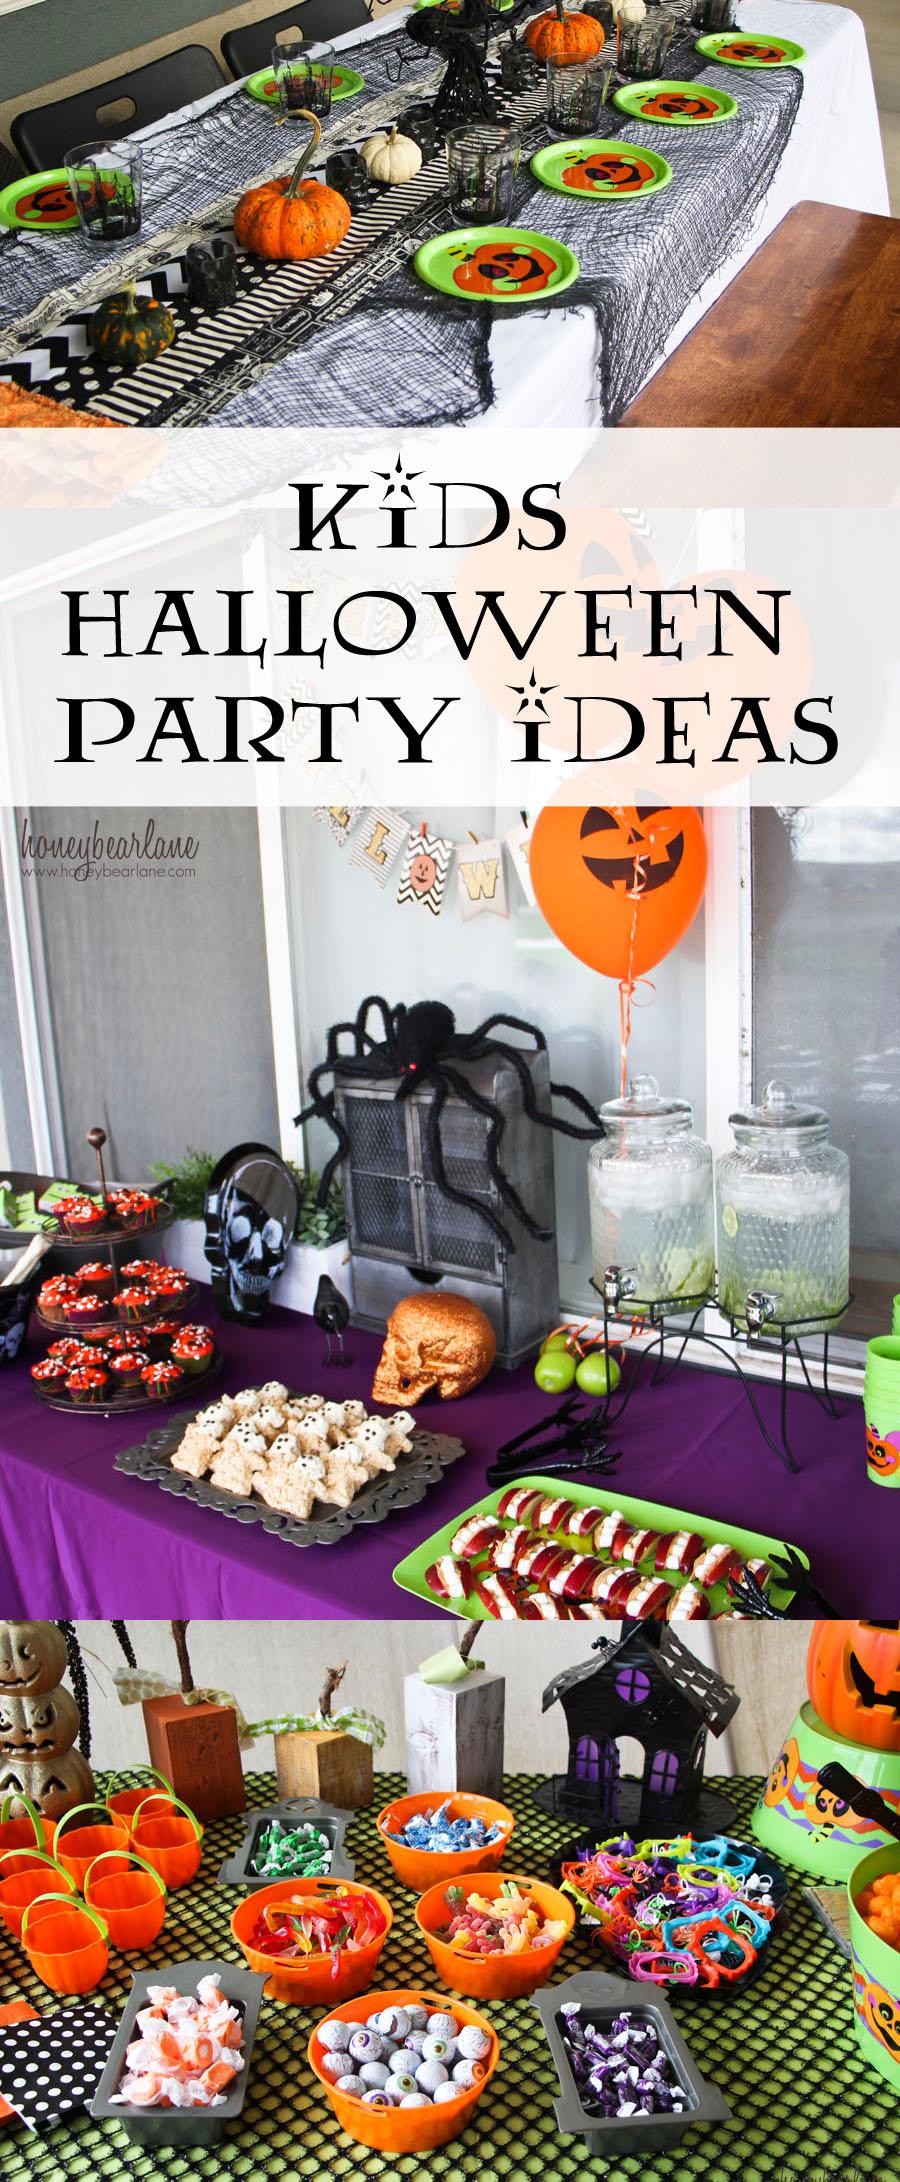 Kids Halloween Party Ideas  Honeybear Lane